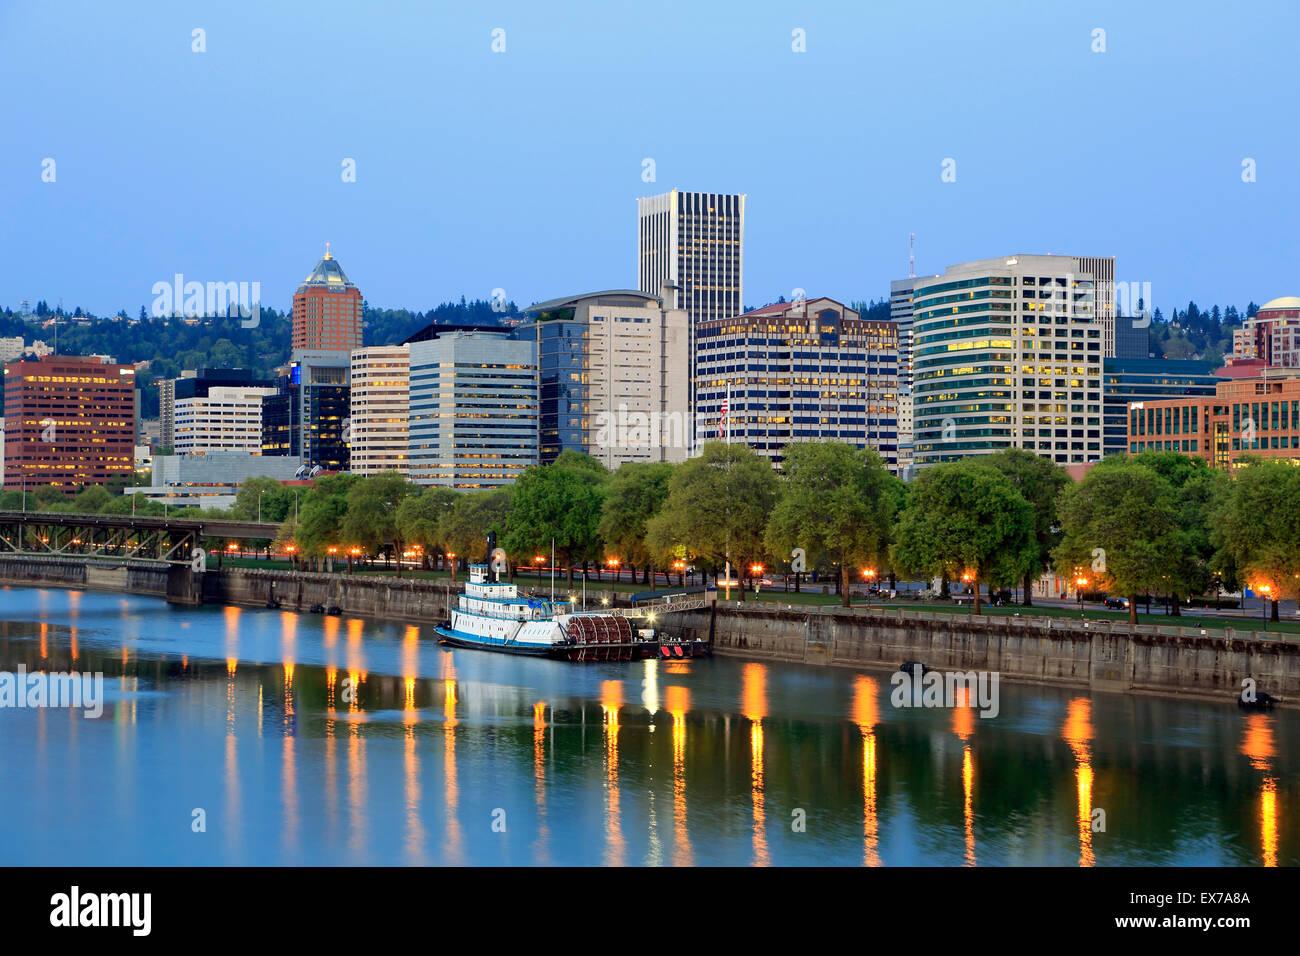 Skyline von Portland und Willamette River, Portland, Oregon USA Stockbild